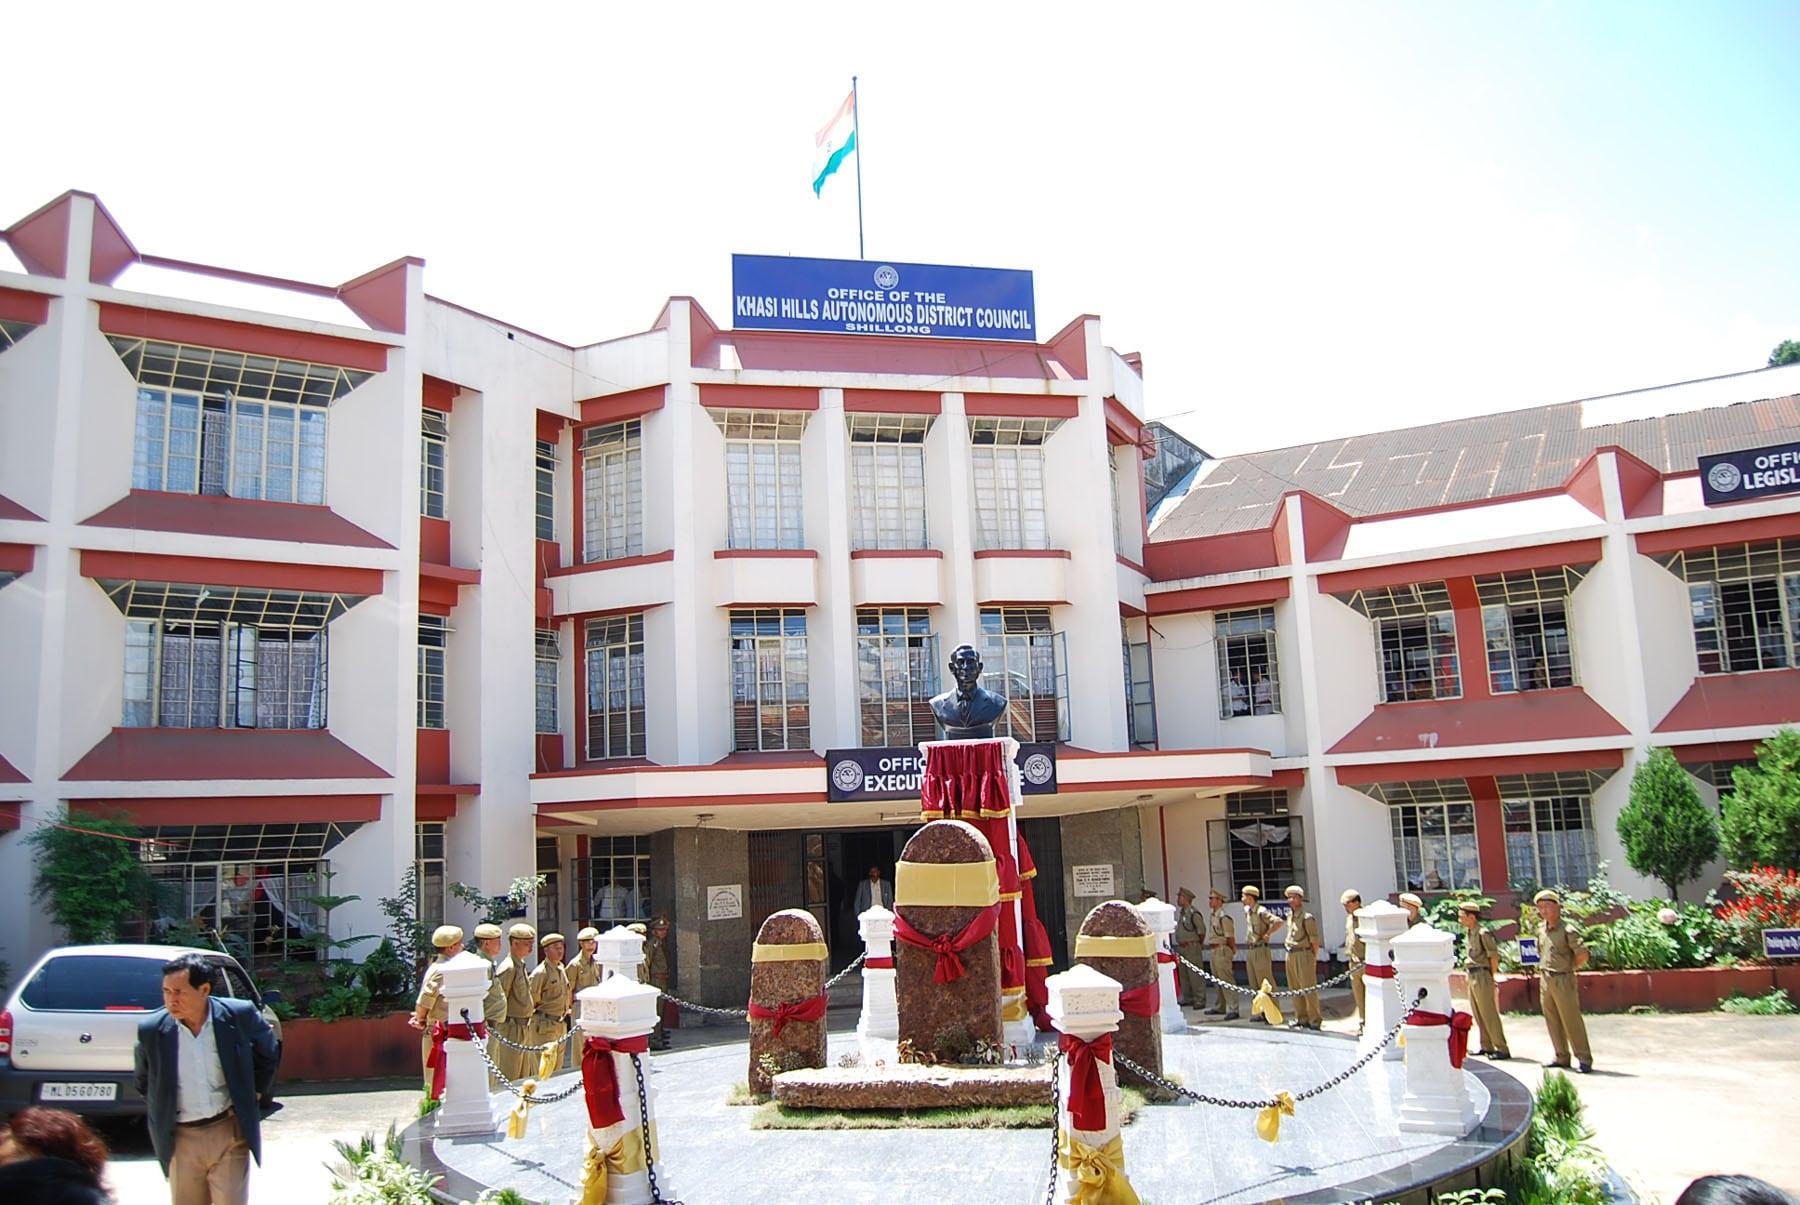 Khasi Hills Autonomous District Council meeting on Oct 3 in Shillong